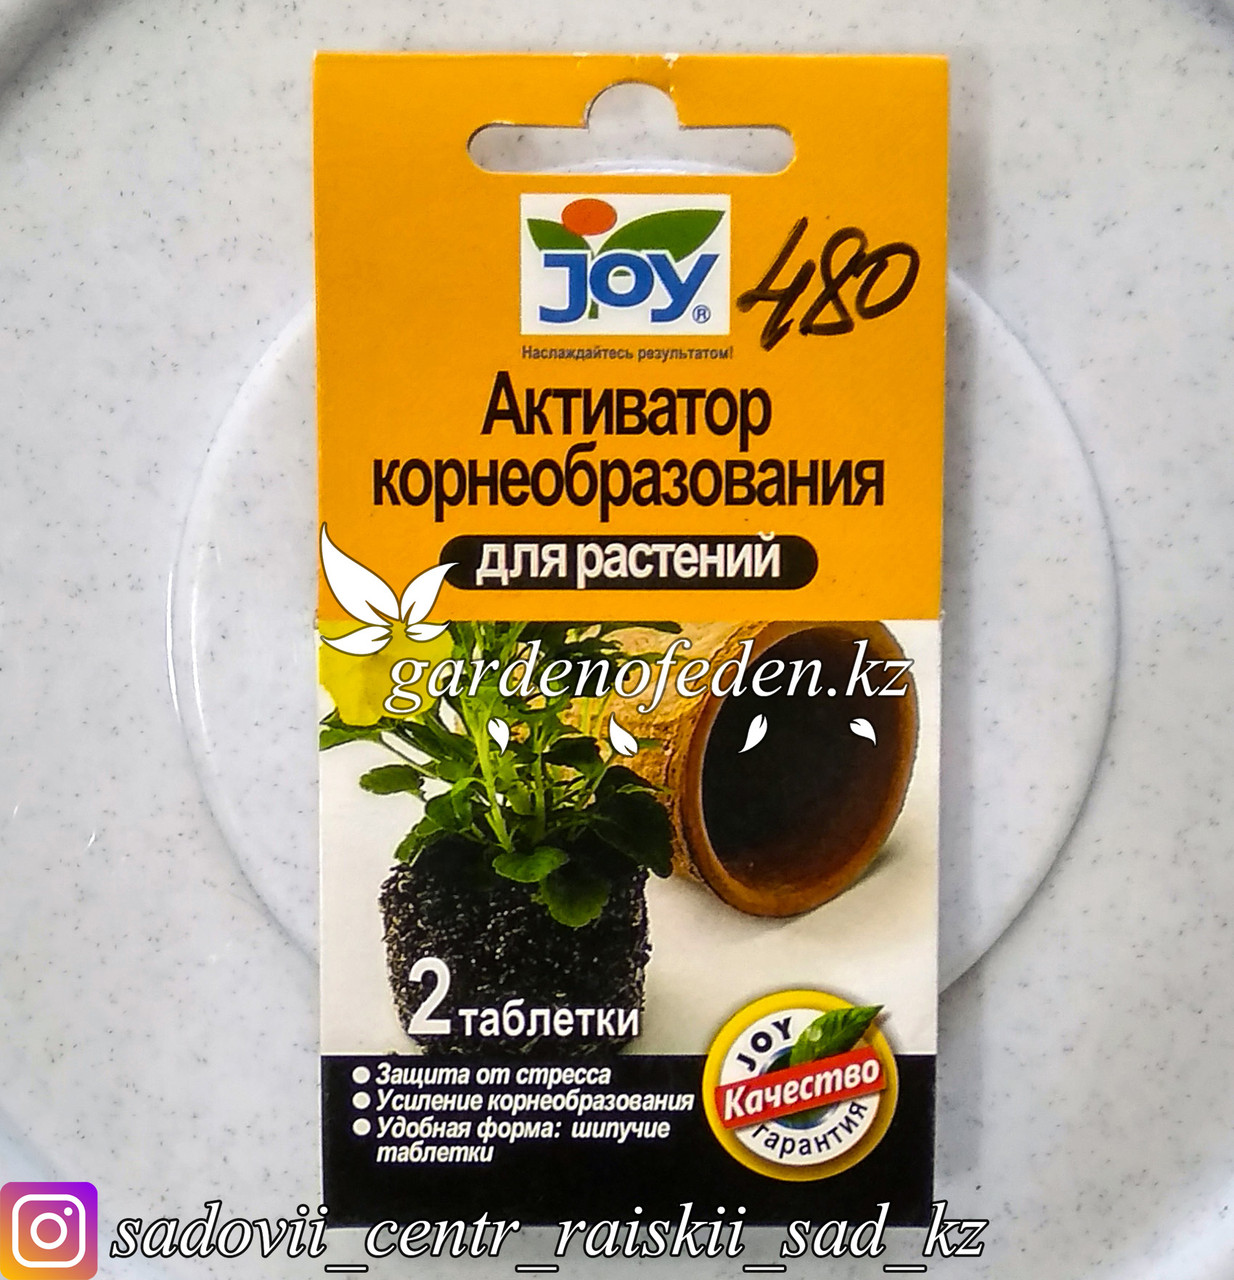 Активатор корнеобразования для растений JOY, 2 таблетки.